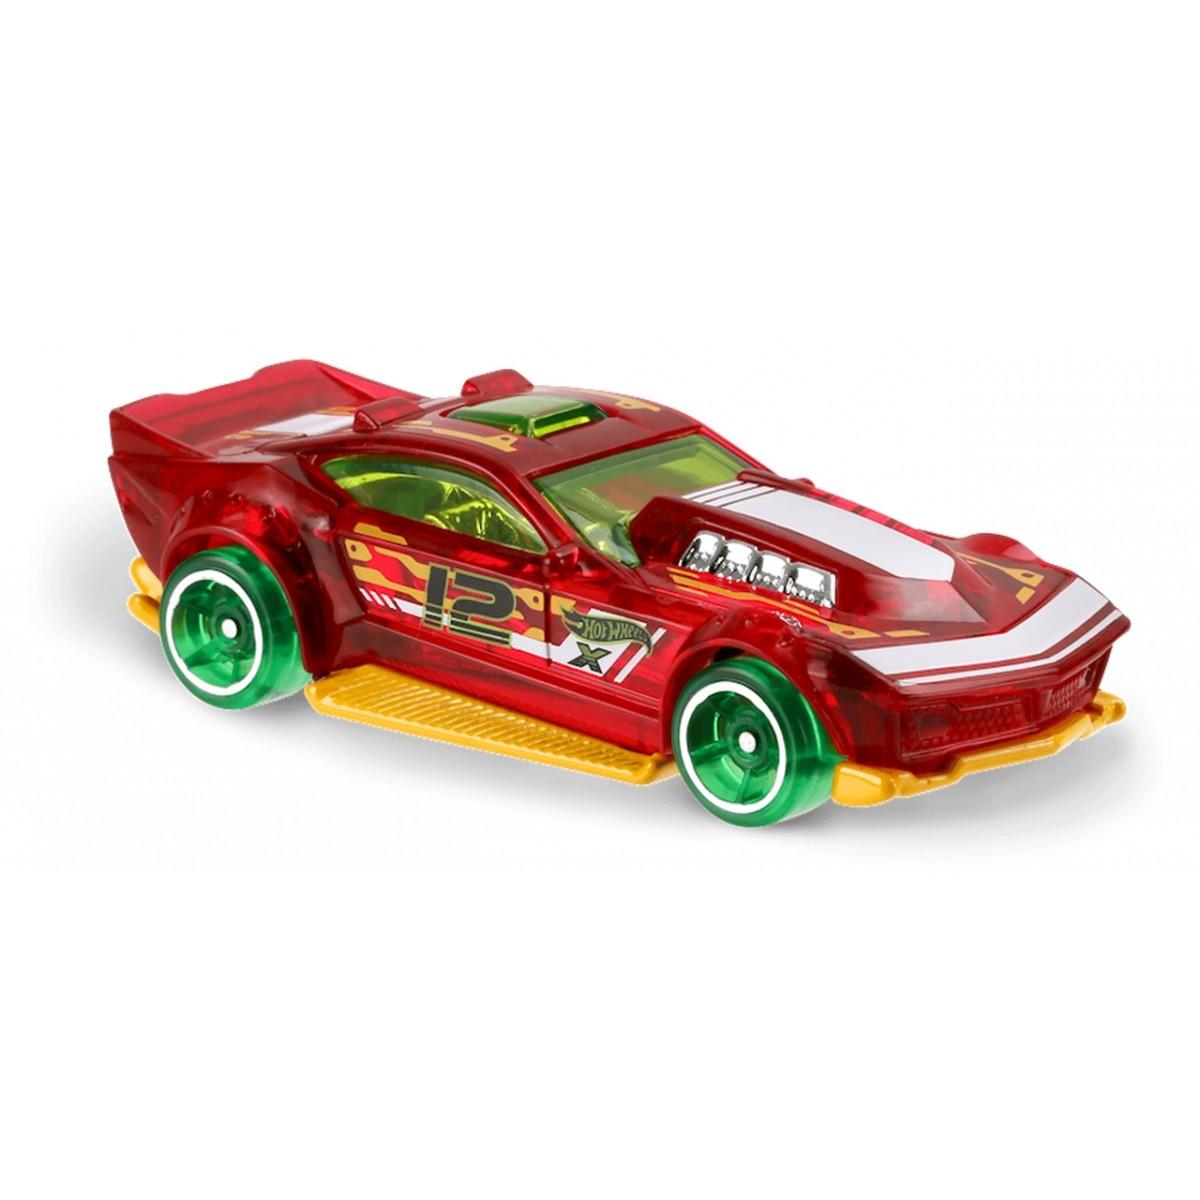 Carrinho Hot Wheels: Drift Rod Vermelho